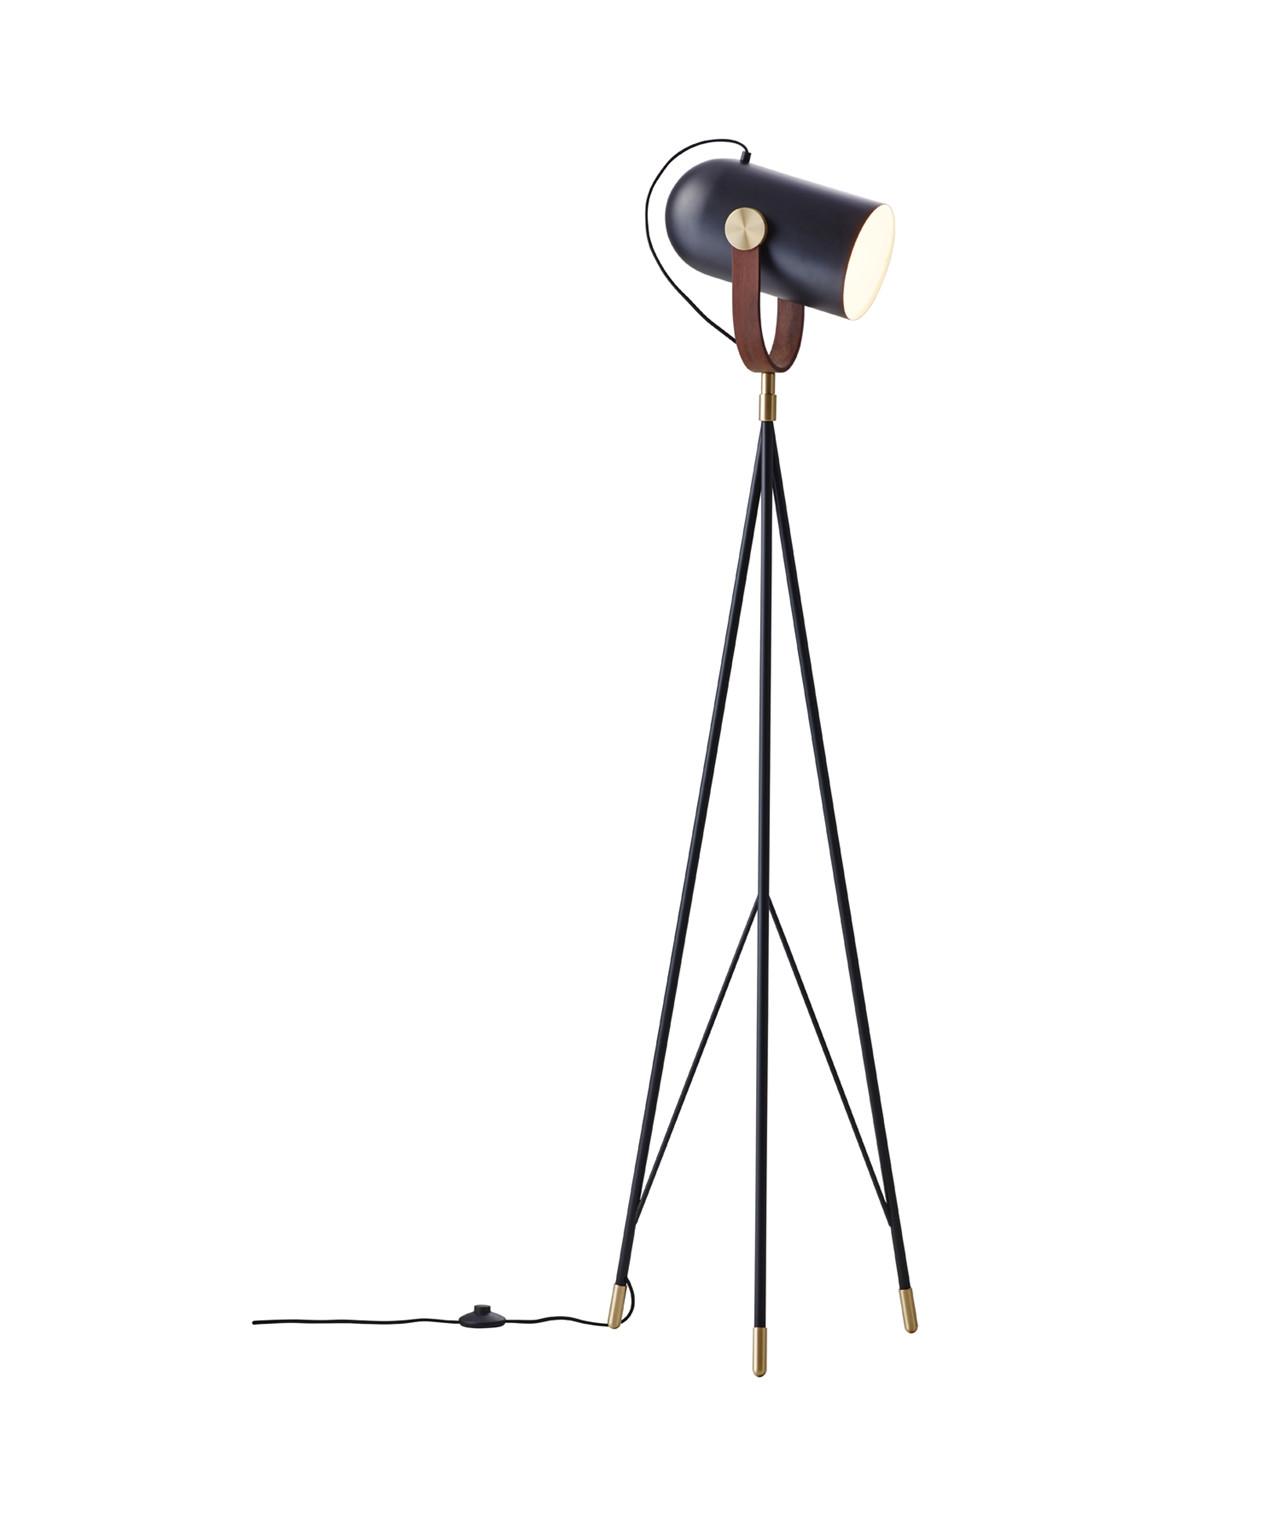 Carronade gulvlampe sort - le klint fra Le klint fra lampemesteren.dk